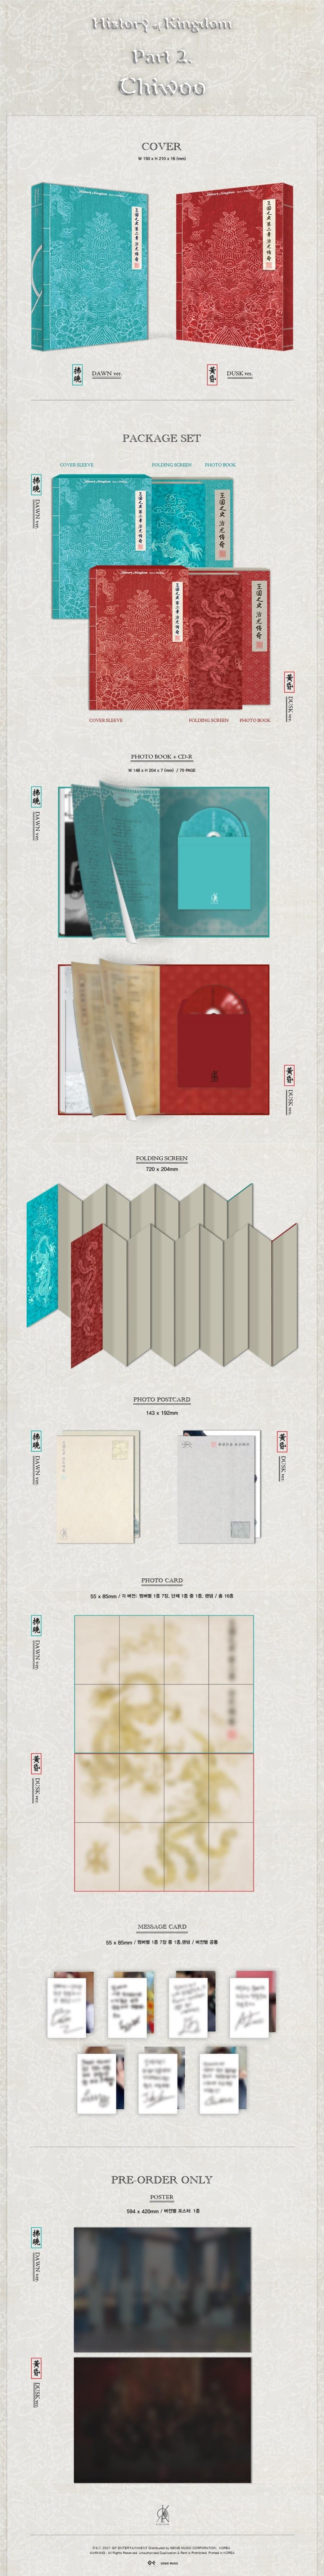 KINGDOM - History Of Kingdom: PartⅡ. Chiwoo